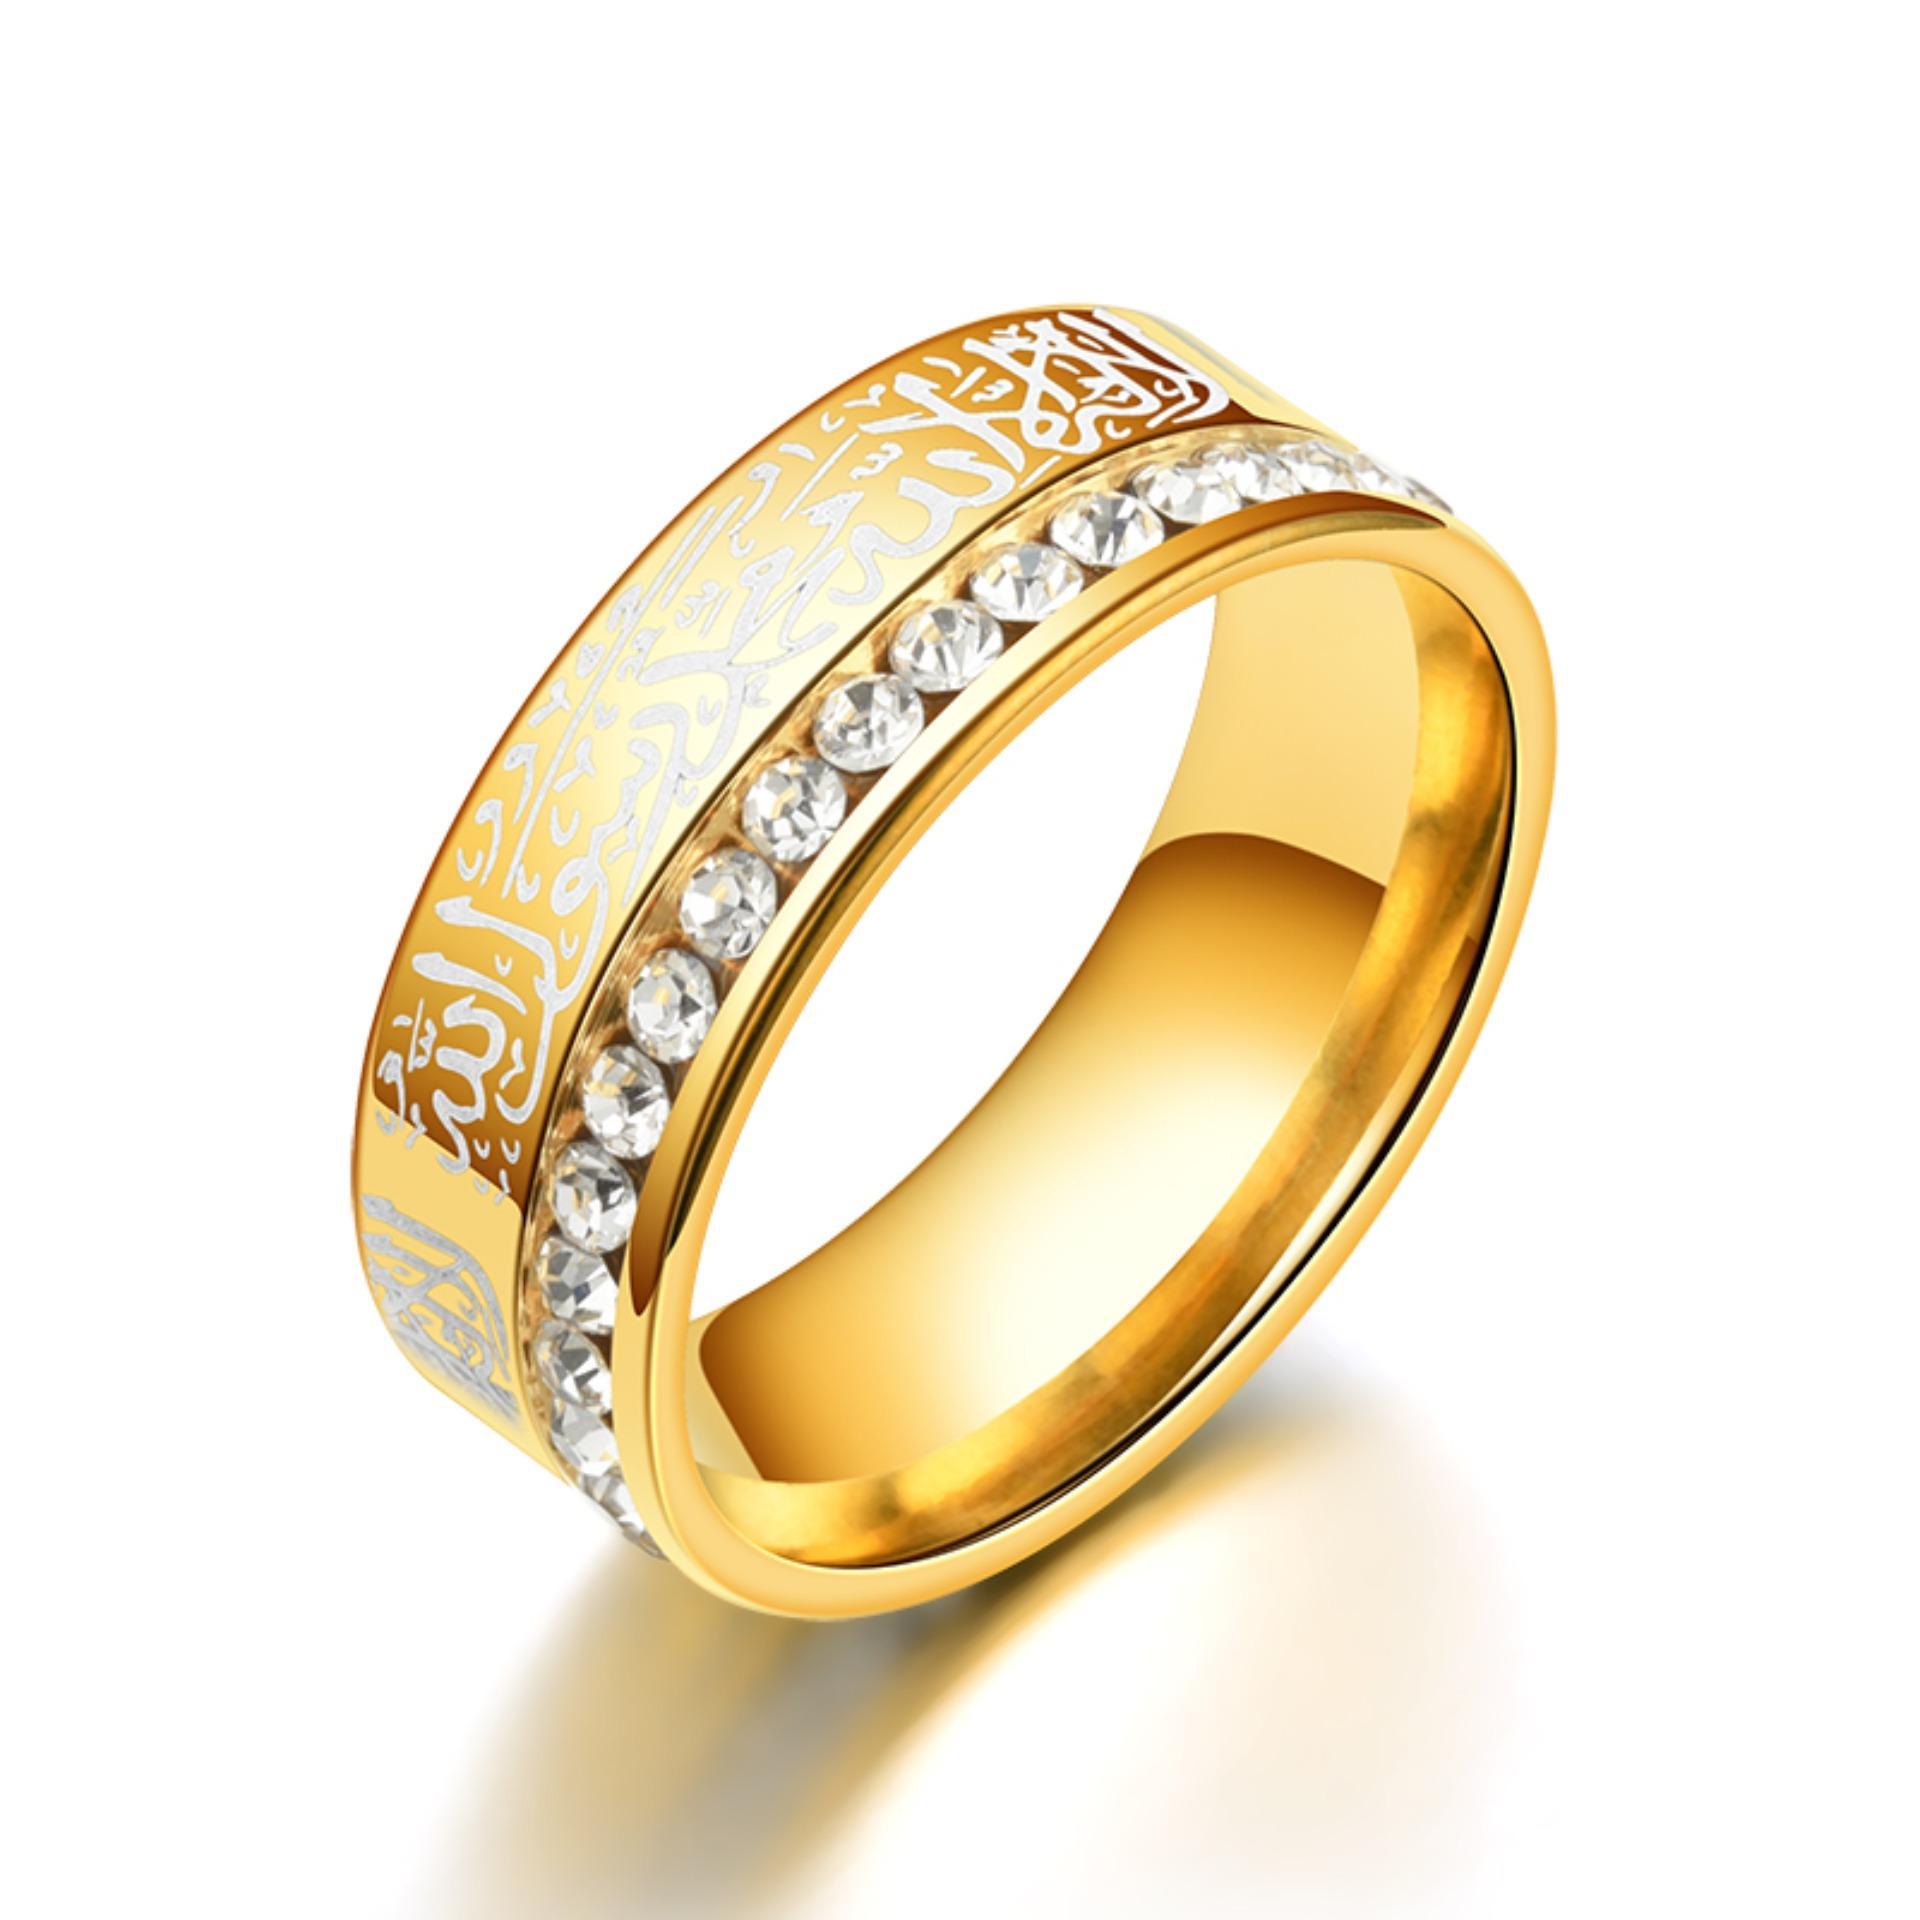 Lrc Cincin Tauhid Islam Muslim Lafadz Syahadat Ring Diamond By Toko Aksesoris Online.